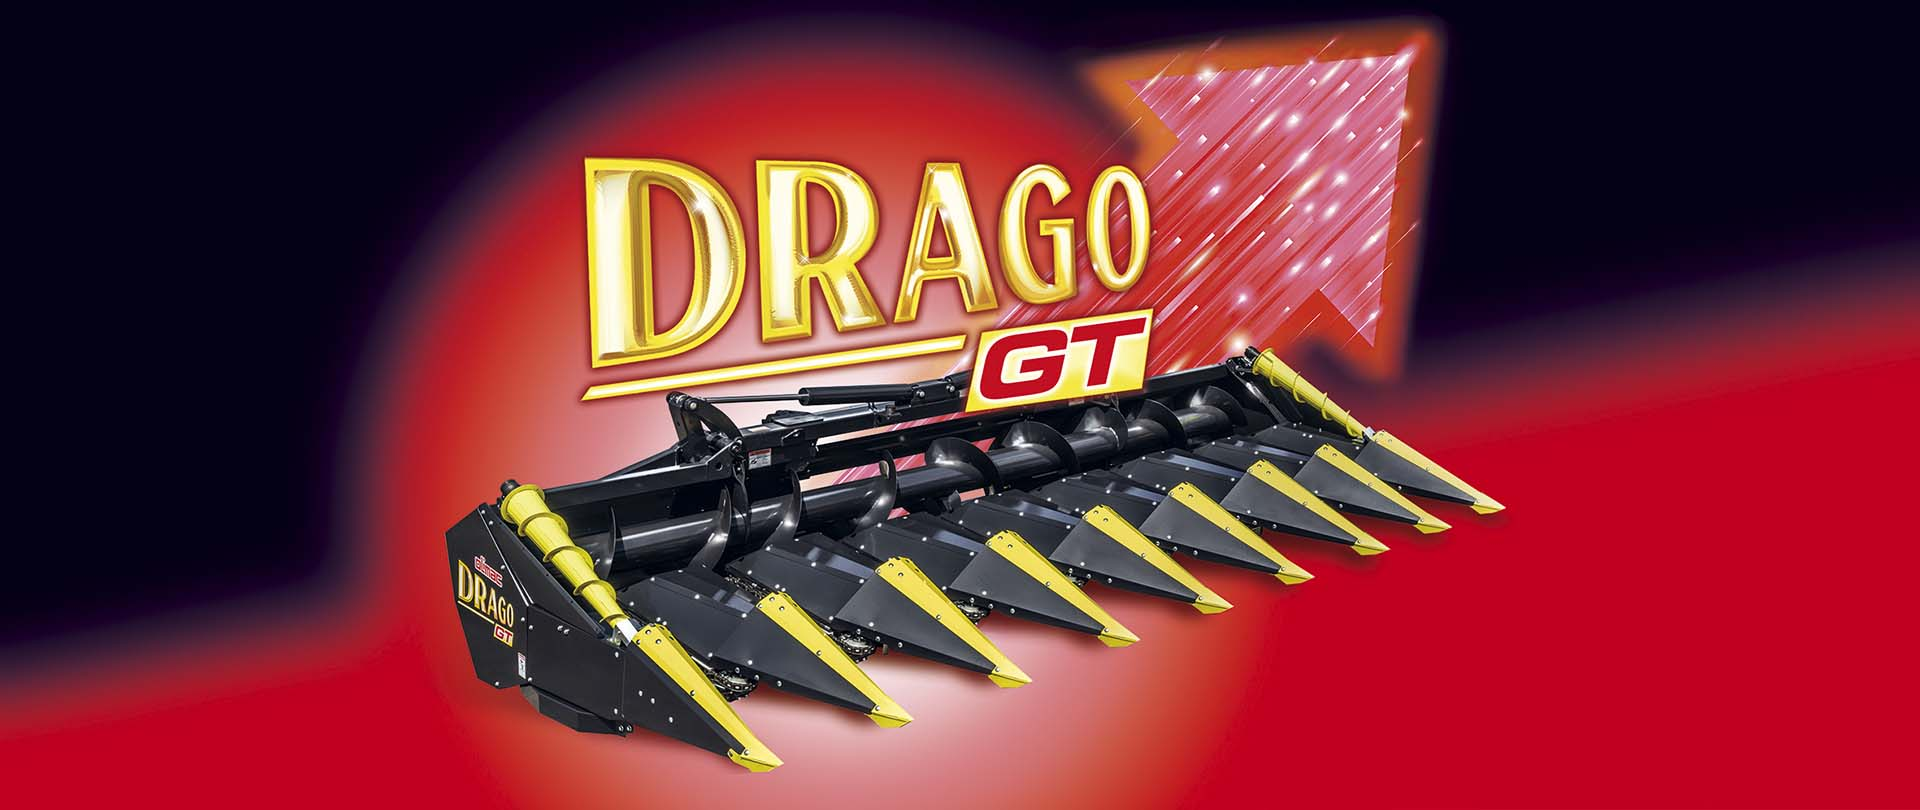 Olimac-drago-gt-spannocchiatore-testata-mais-corn-head-maispfluecker-cabezal-maíz